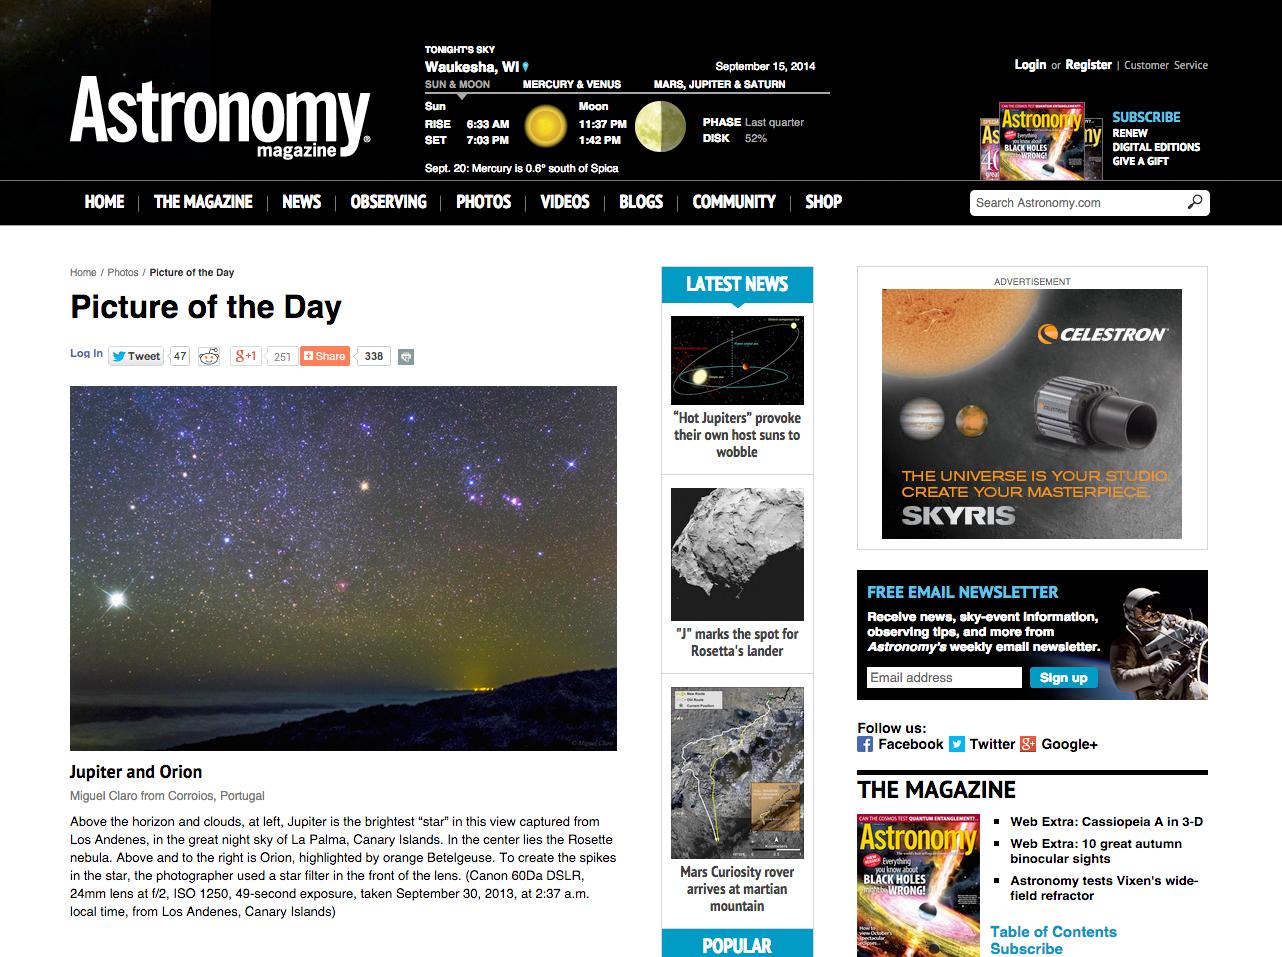 AstronomyMagazinePOD-Setembro2014